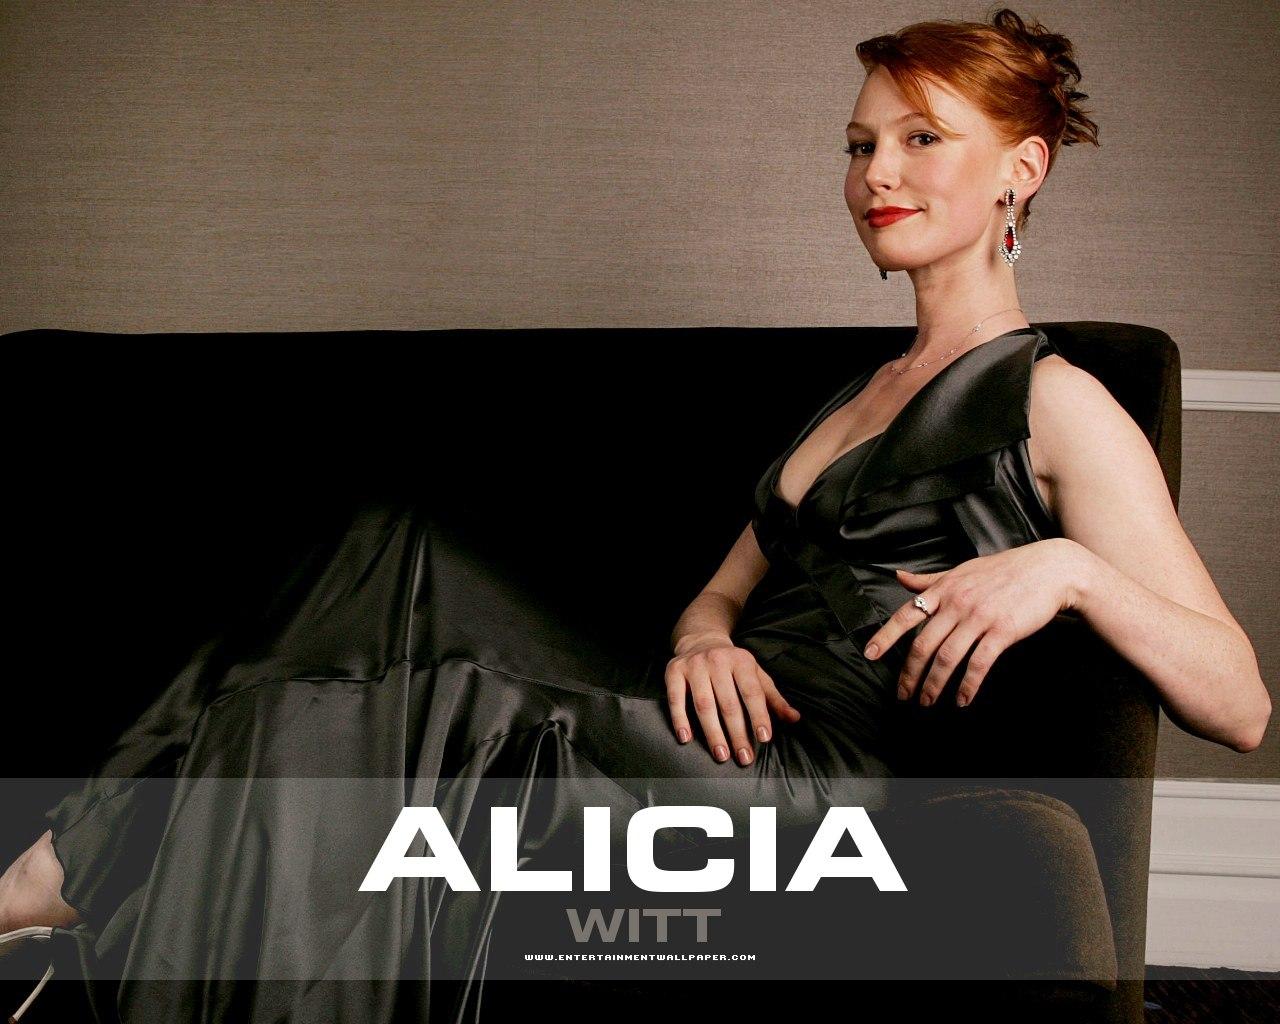 http://3.bp.blogspot.com/-_PUnZnRJ9BQ/T2BFV1NyI-I/AAAAAAAAOk8/t586m9jtfk8/s1600/Alicia+Witt+Wallpaper+-+2.jpg